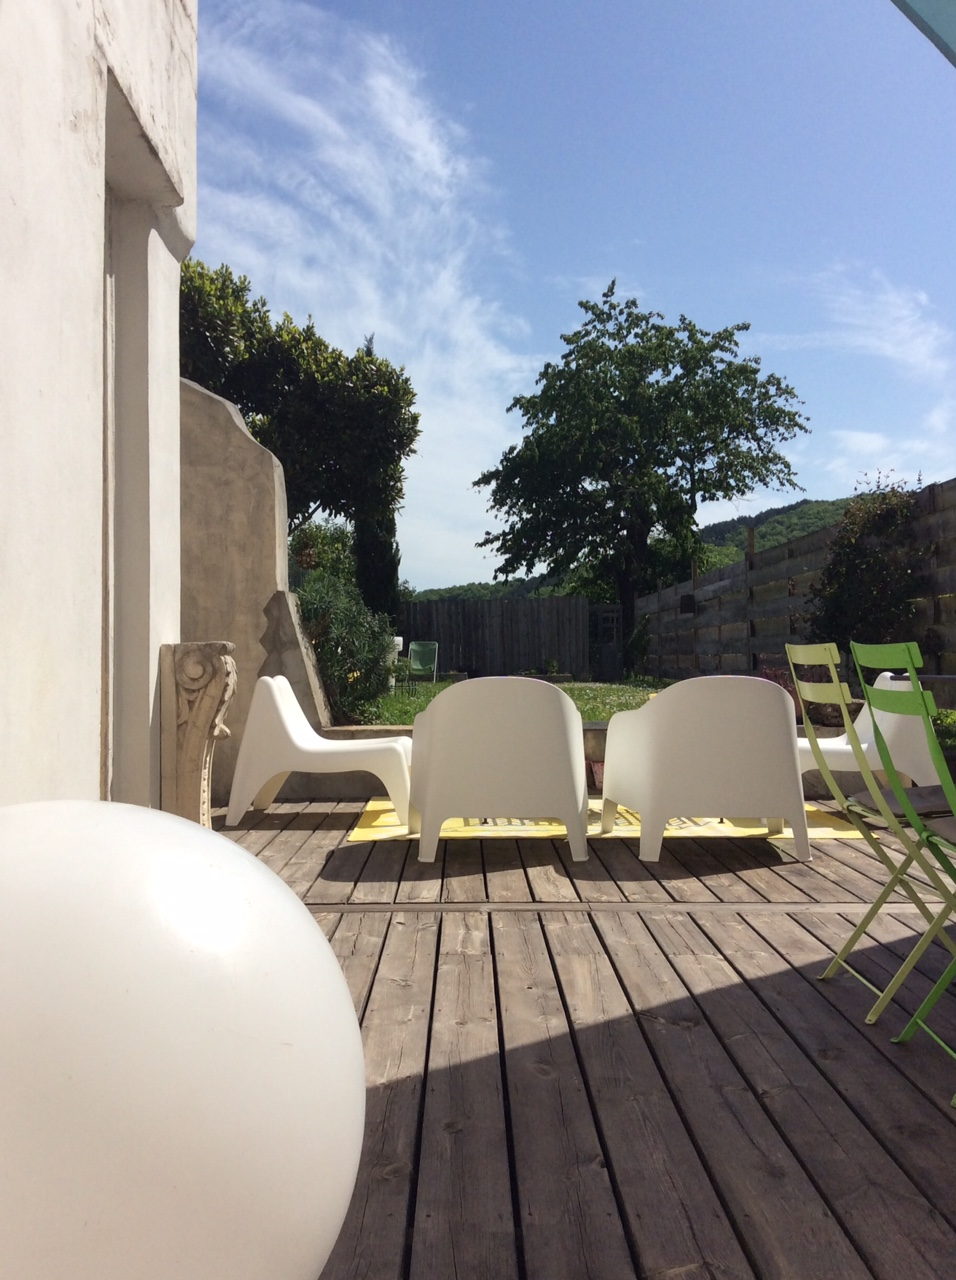 Cahors juin jardins le festival qui cultive l 39 art mai 2017 for Cahors jardin juin 2015